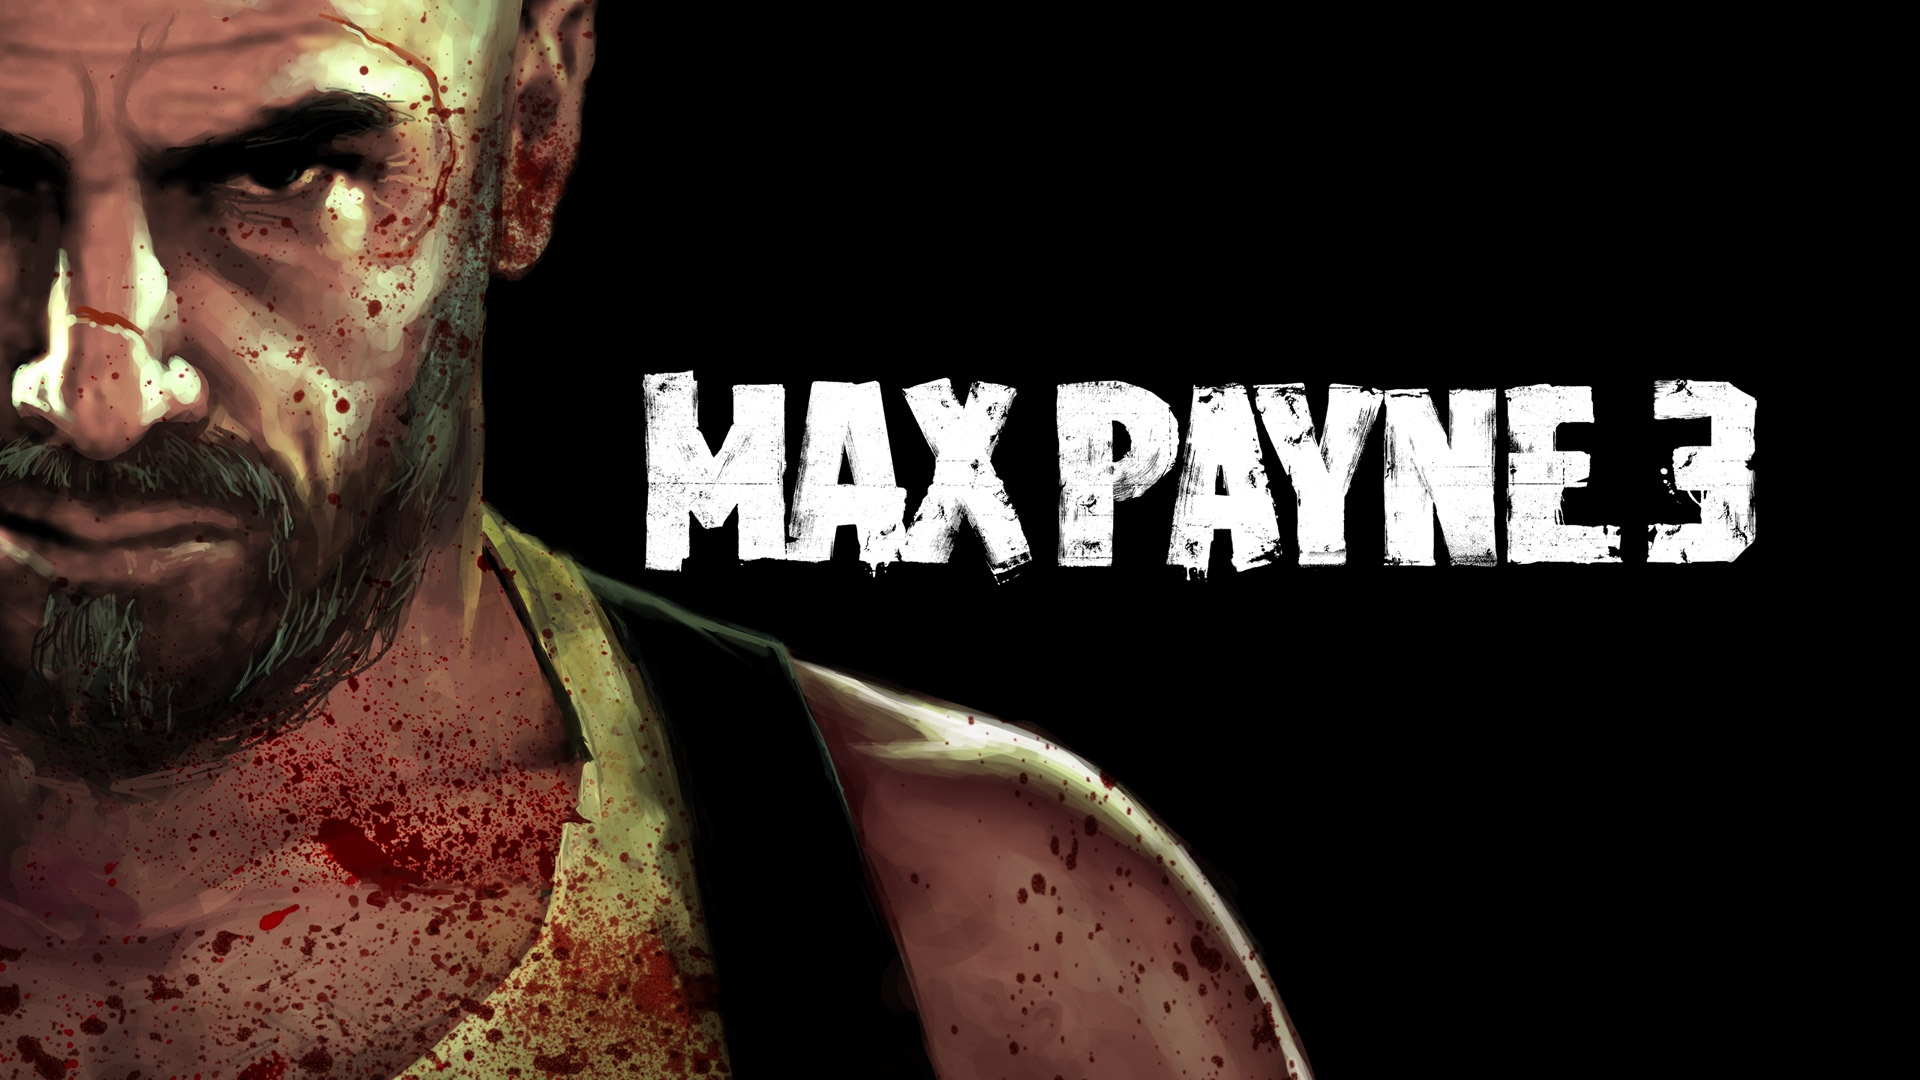 http://1.bp.blogspot.com/-GYRR7fMjuNY/UC-1emHFz1I/AAAAAAAAHIU/hzmtdZEWhP0/s0/max-payne-3-1920x1080-wallpaper.jpg